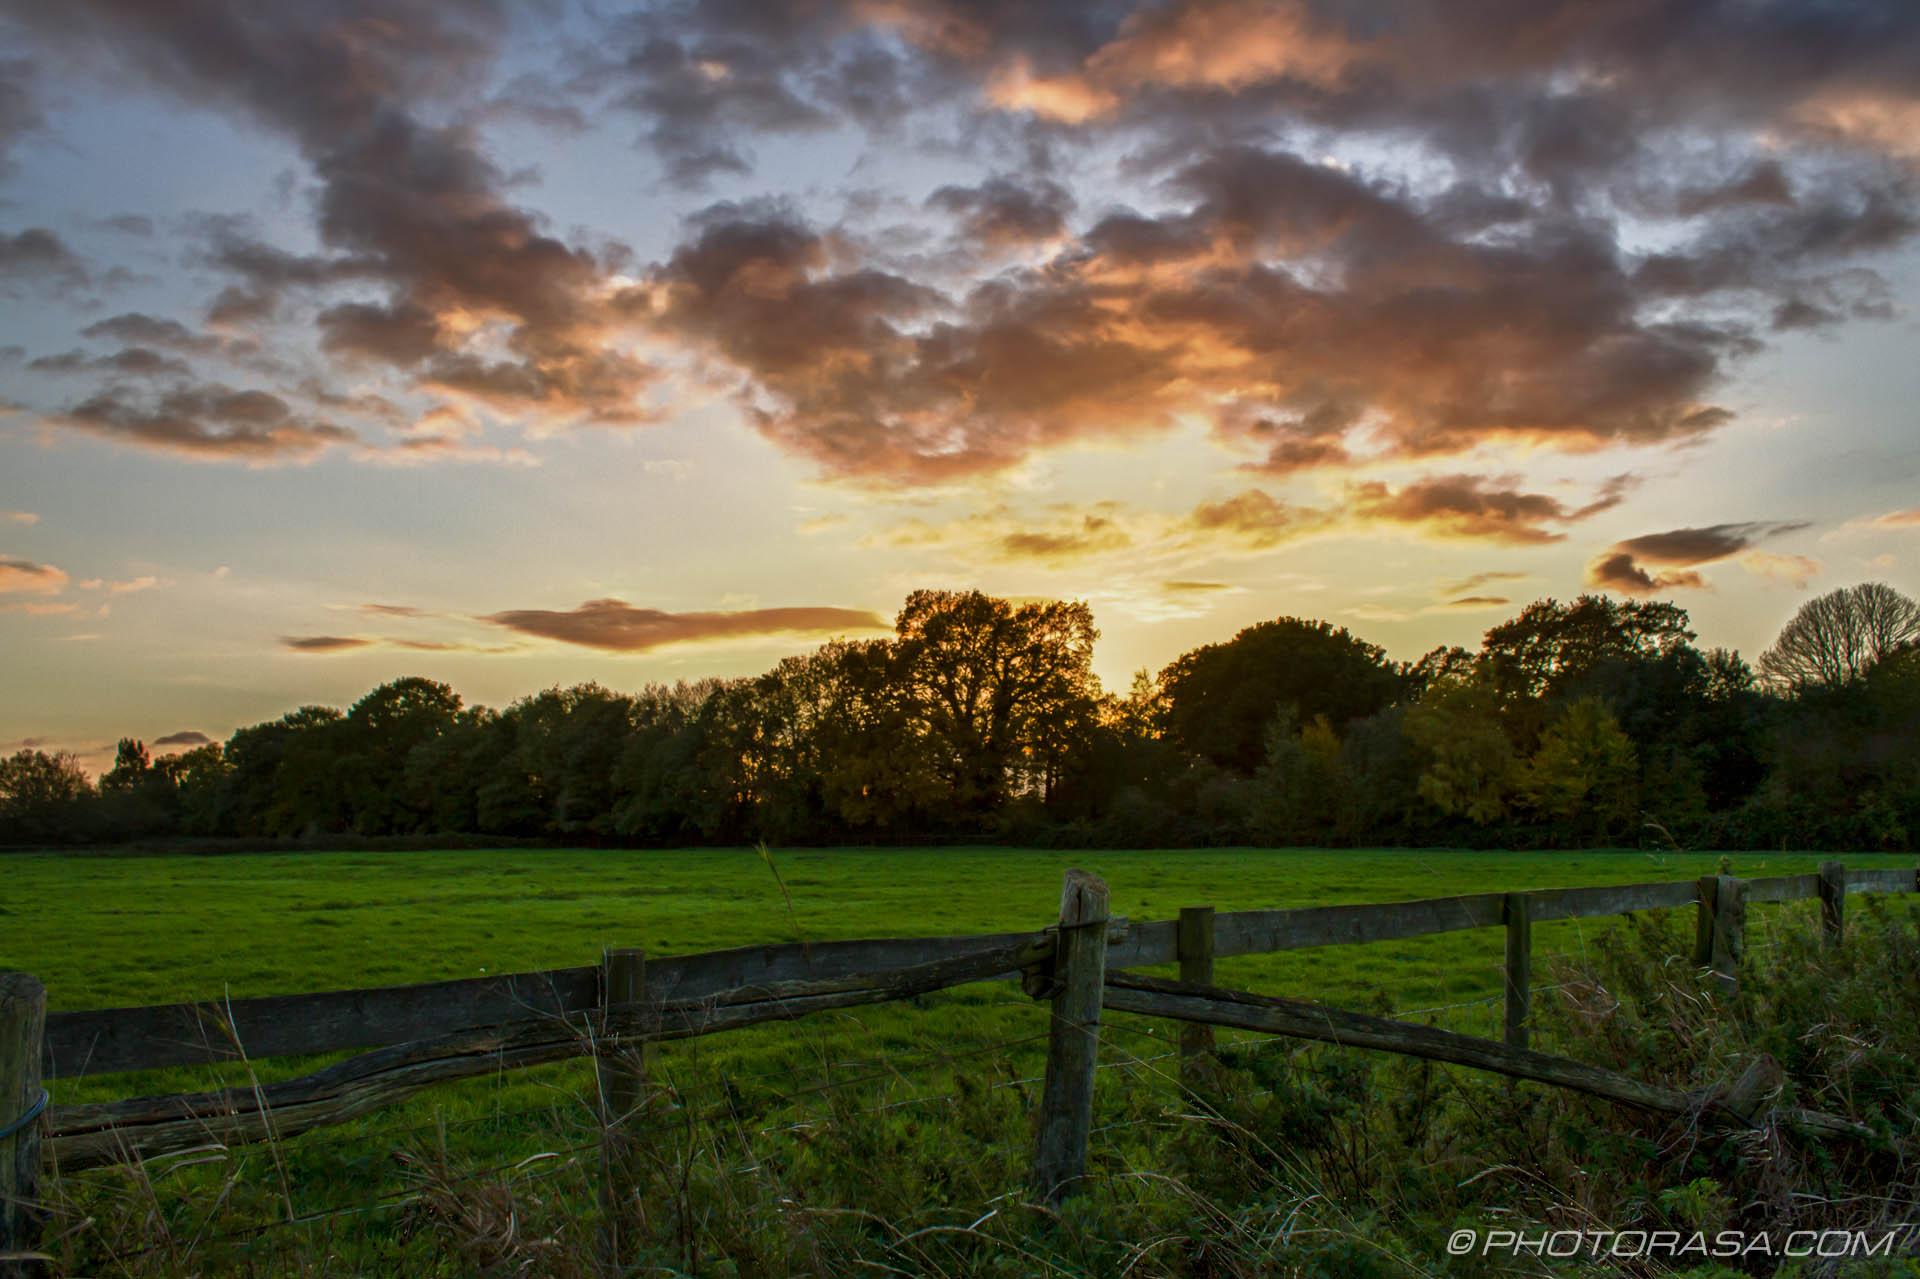 http://photorasa.com/november-evening-sky-farmers-fields/dark-clouds-over-field-at-sunset/